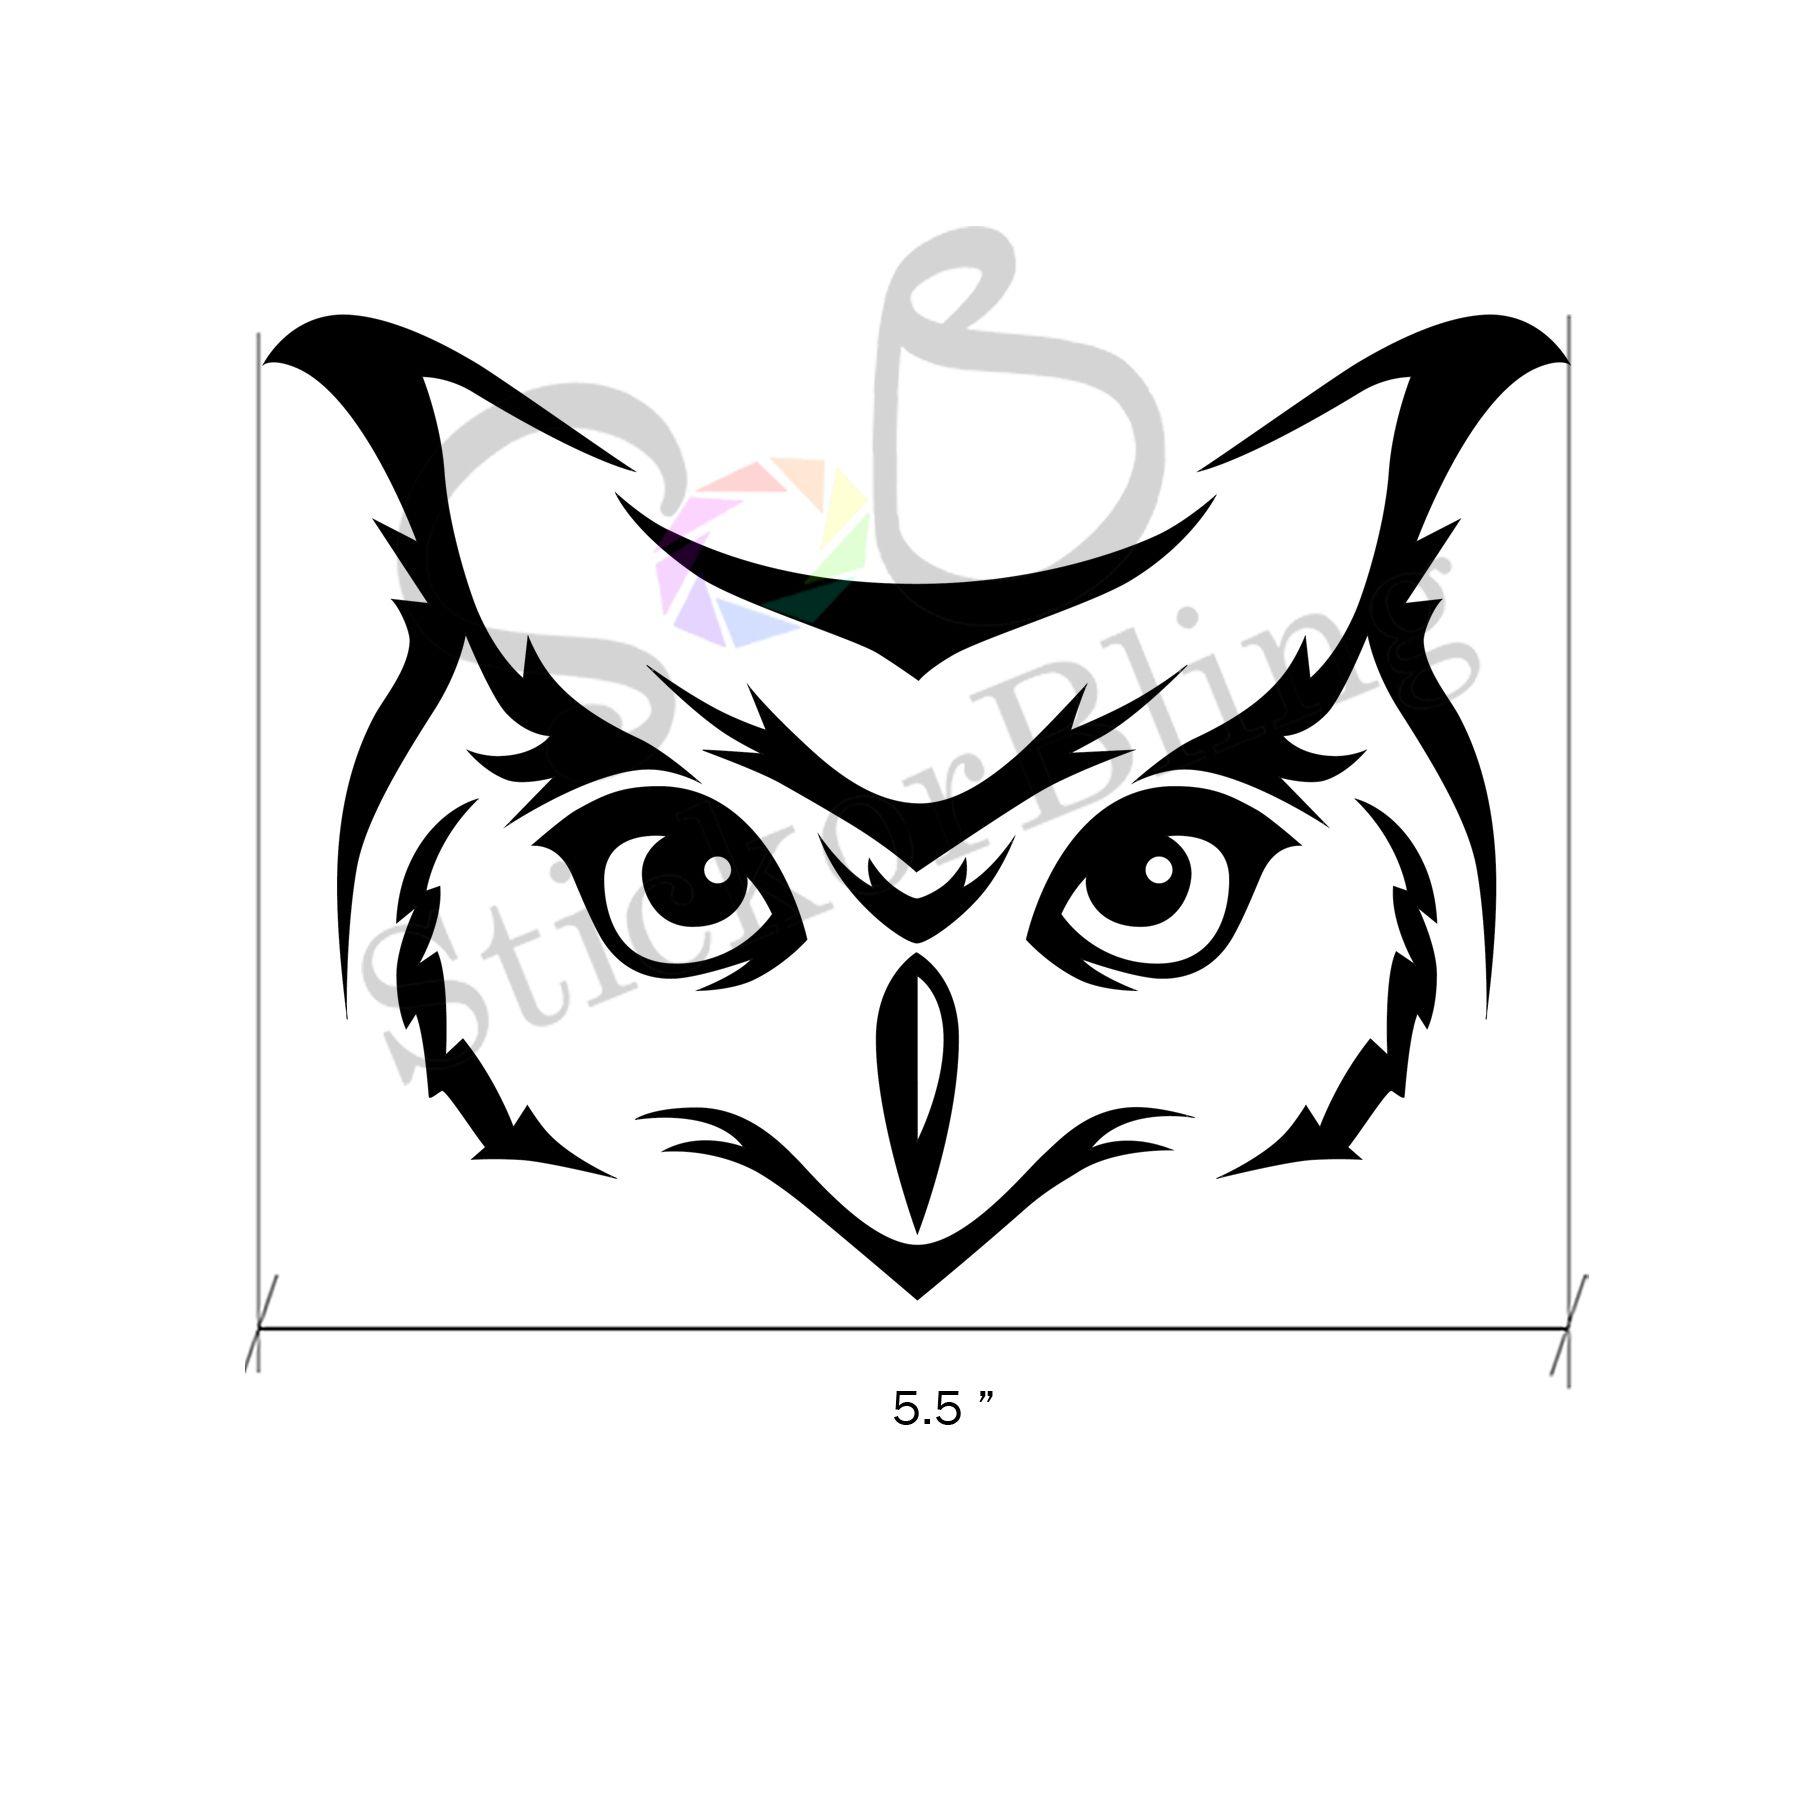 Owl Die Cut Vinyl Decal Sticker Car Window Bumper Computer - Owl custom vinyl decals for car